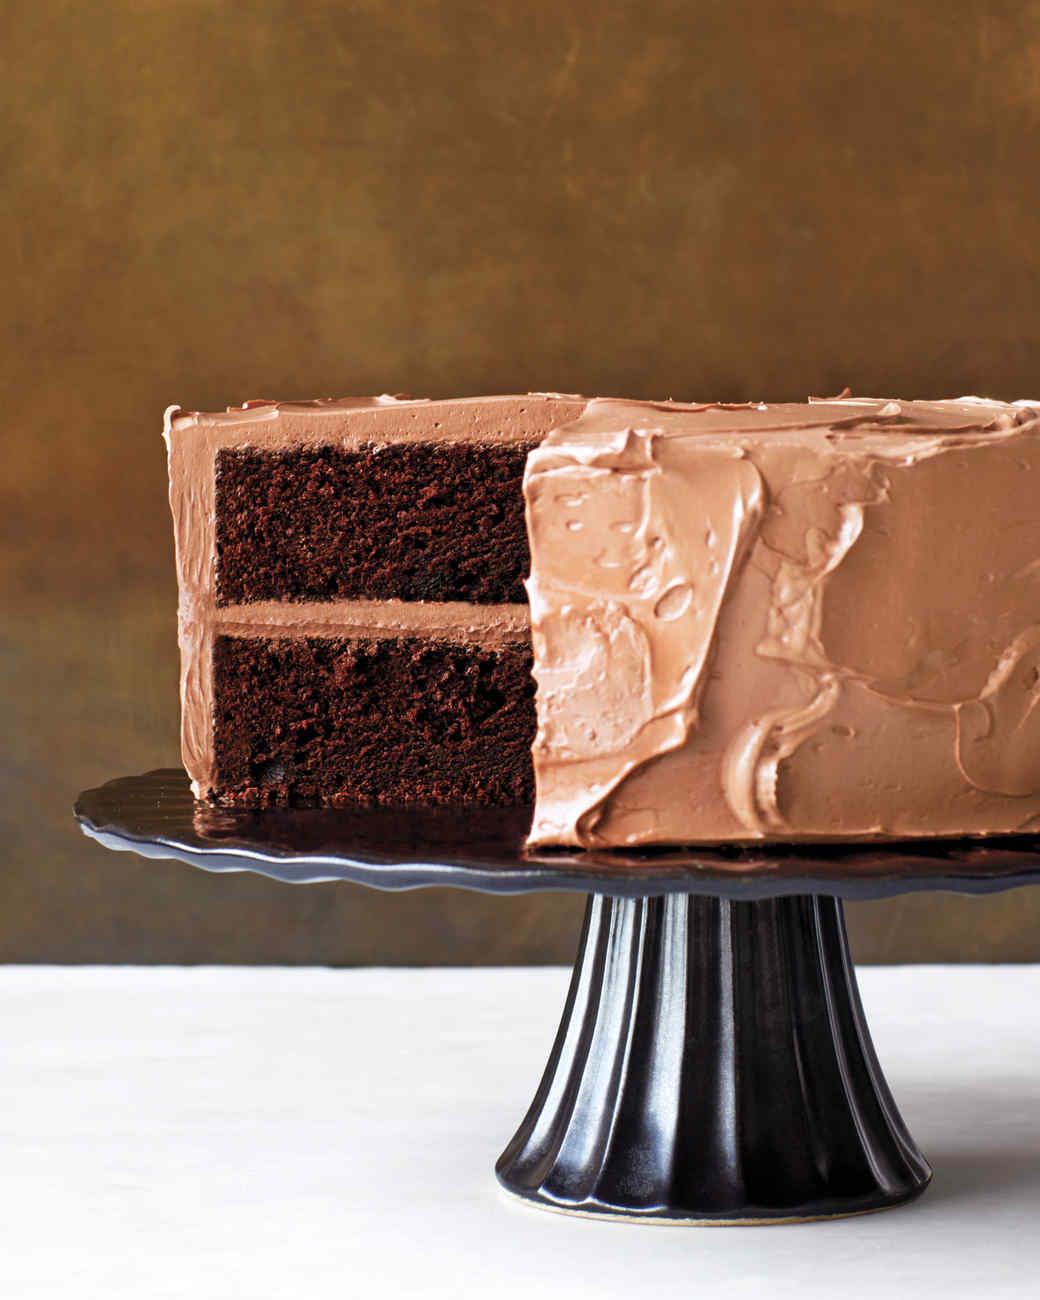 devils-food-cake-beauty-359-d112204-r.jpg